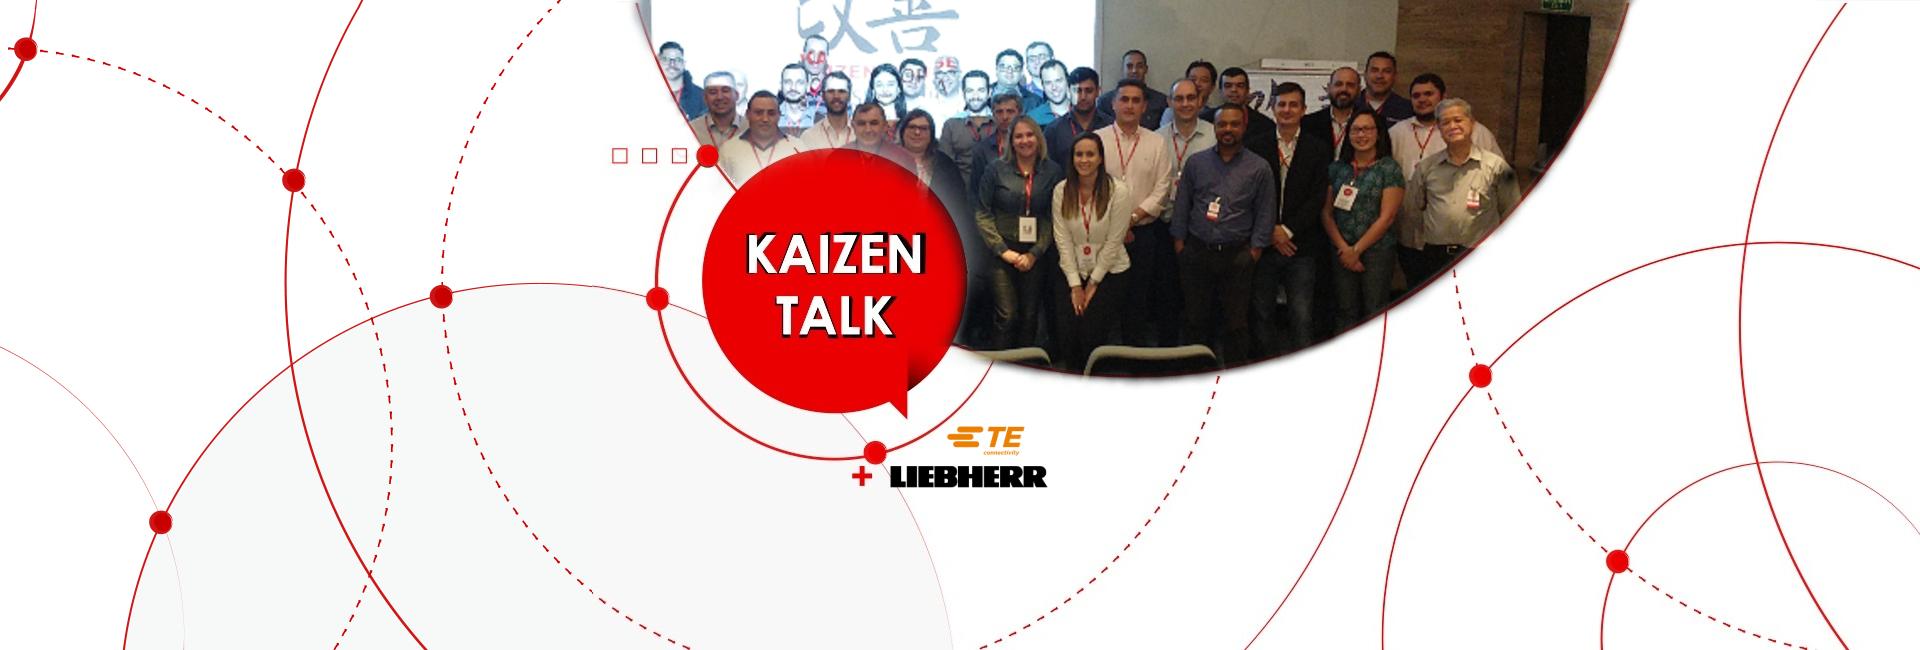 Kaizen Talk